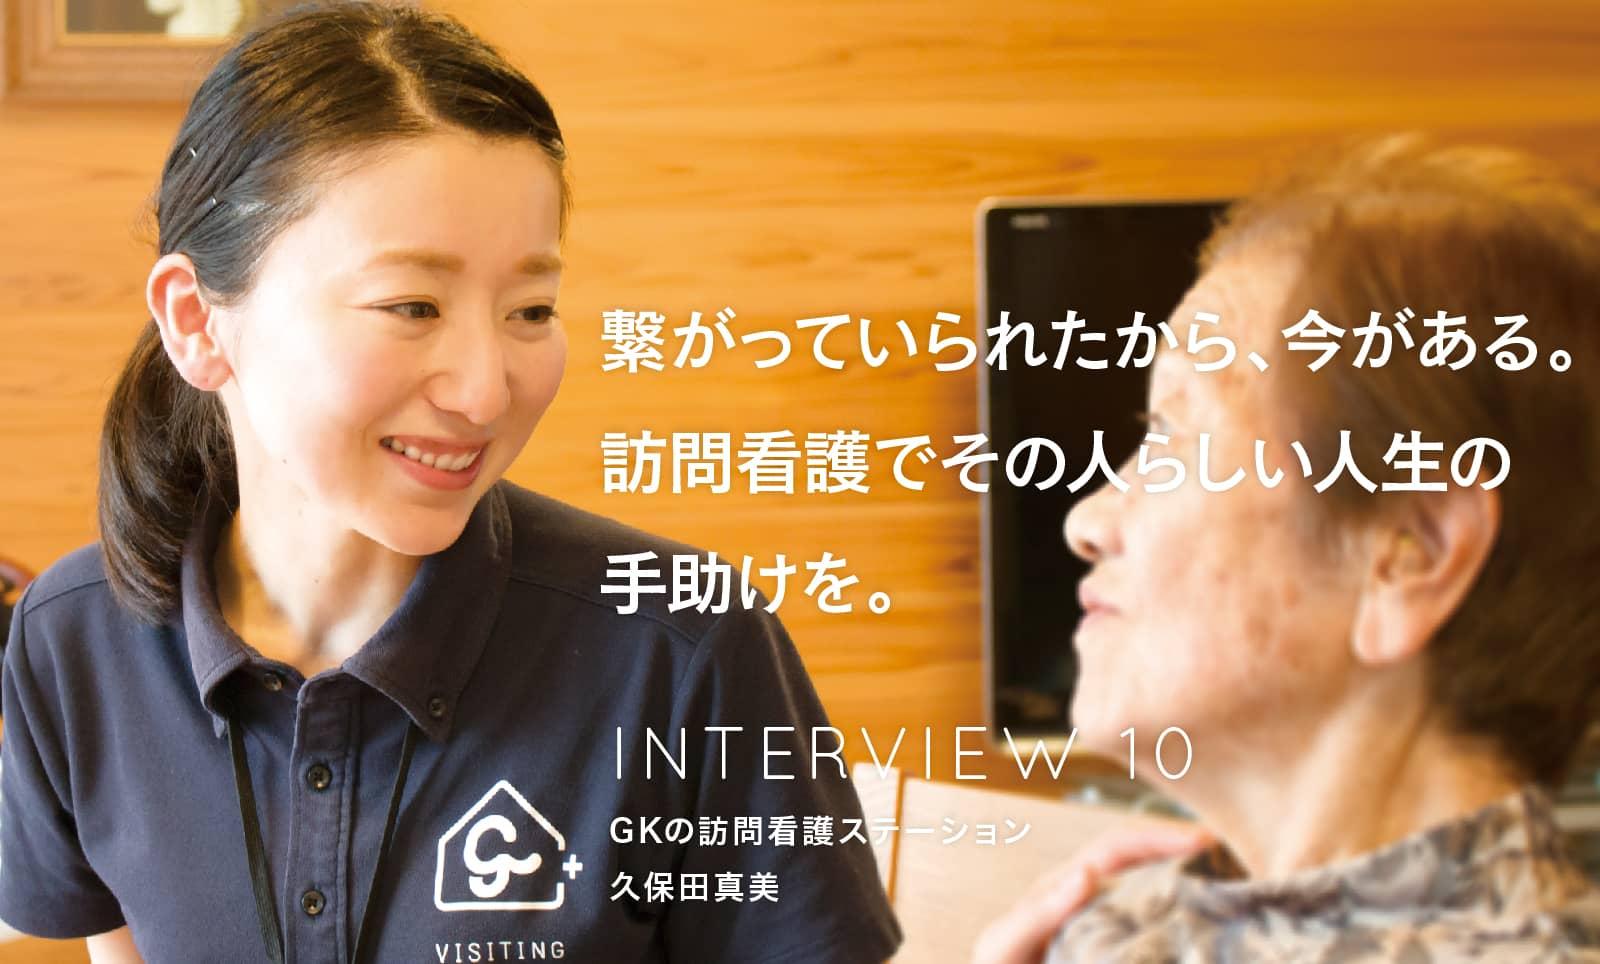 INTERVIEW 08 GKの訪問看護ステーション 久保田 真美 さん